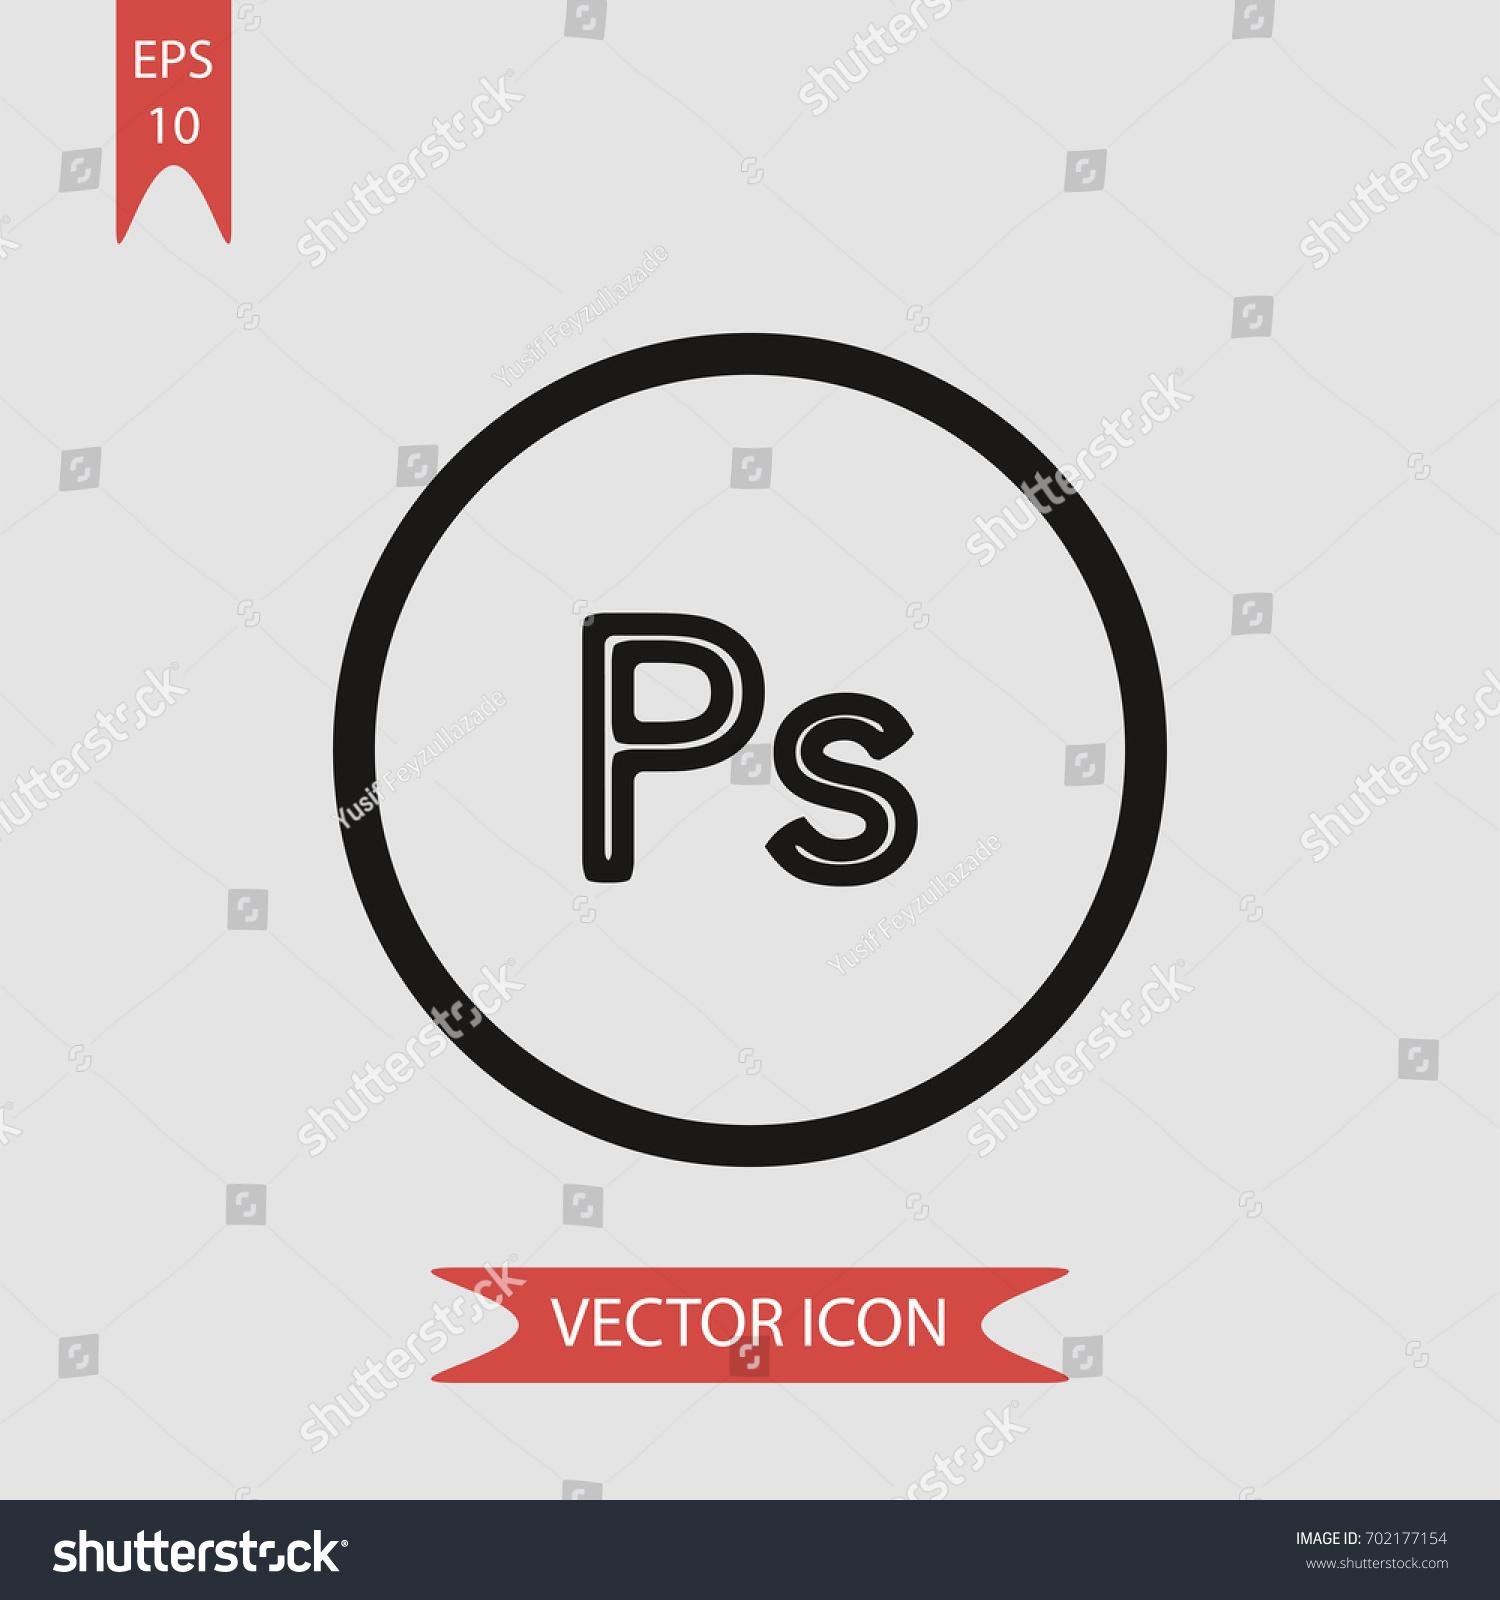 Ps circle vector icon illustration symbol stock vector 702177154 ps in circle vector icon illustration symbol buycottarizona